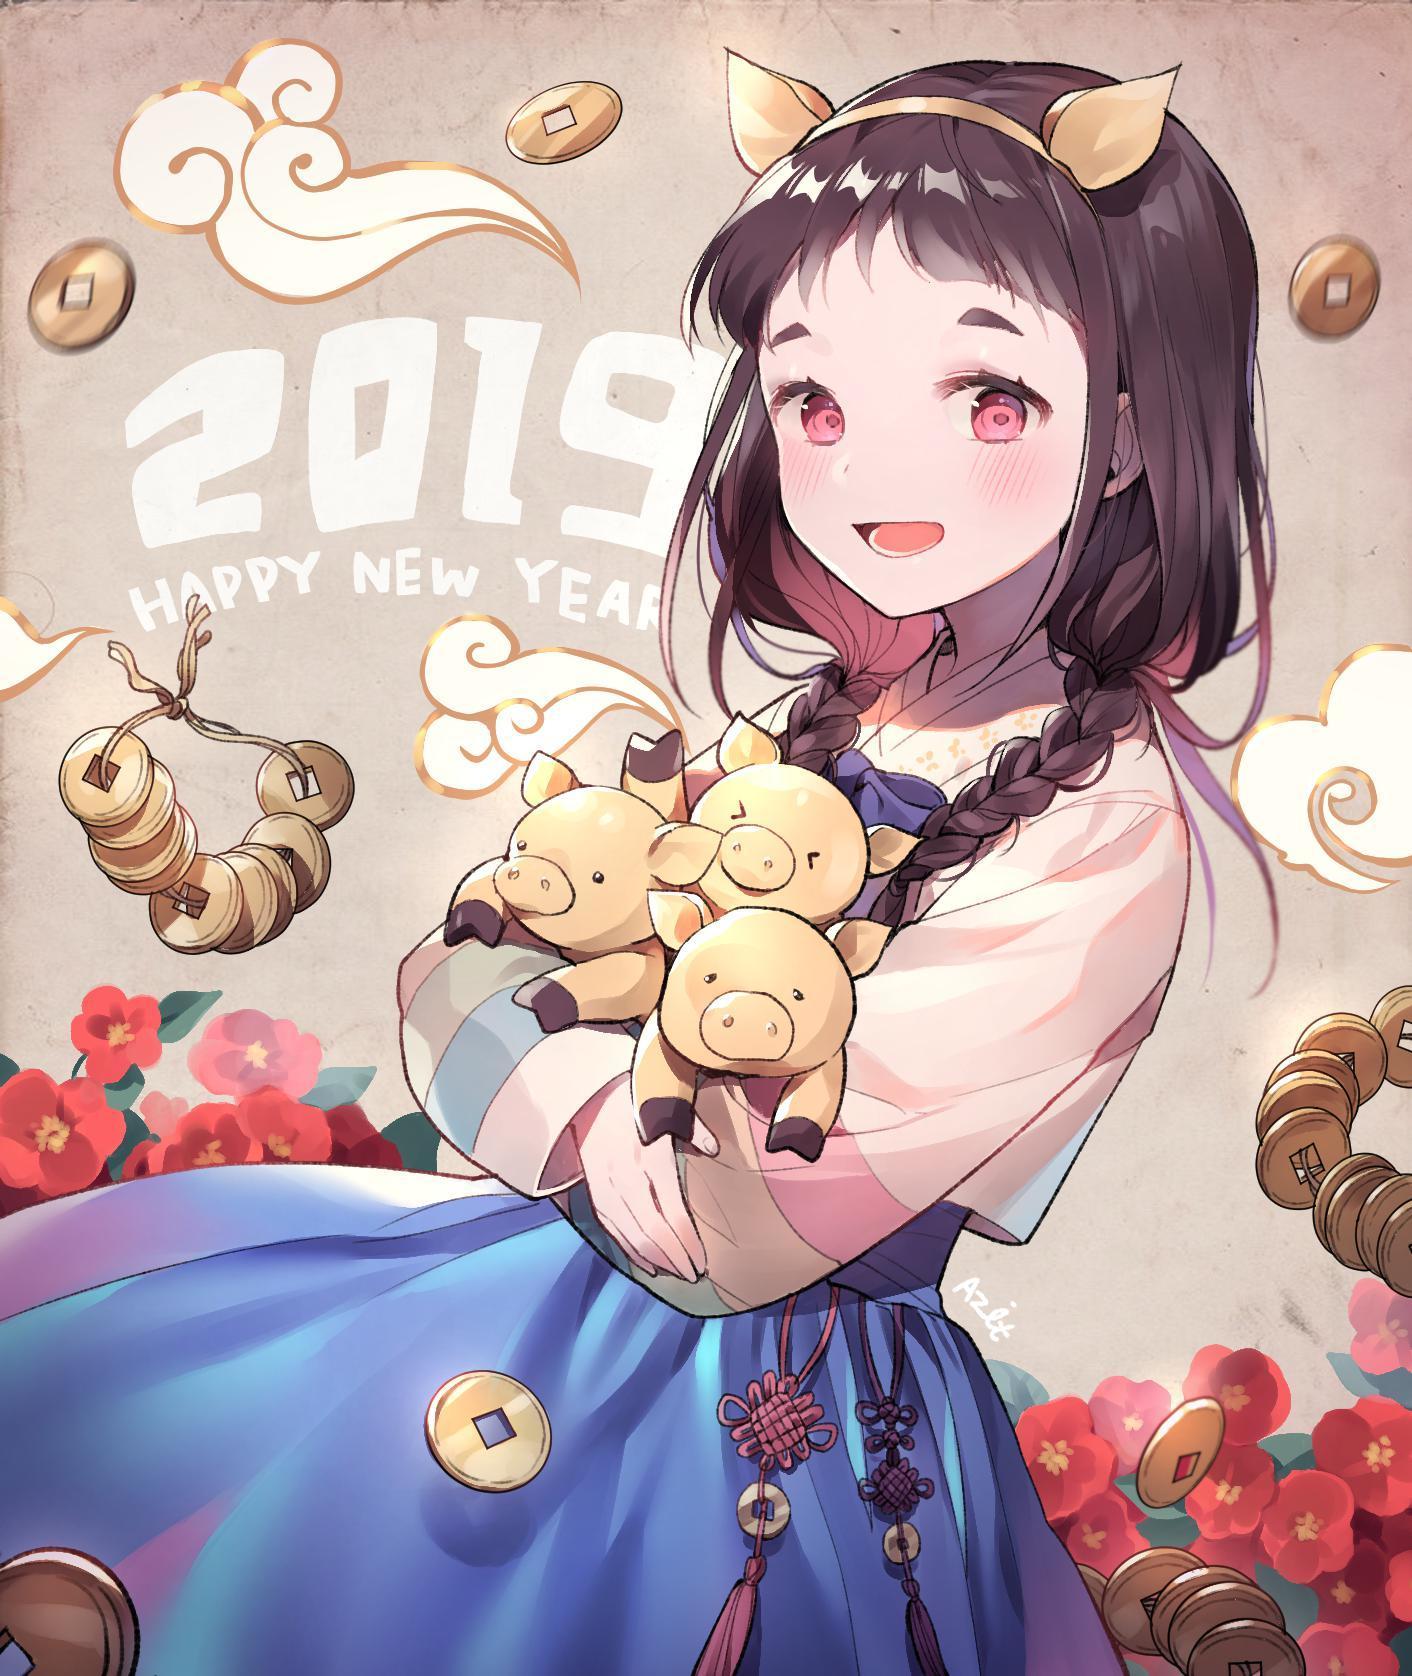 P站画师作品Happy New Year !